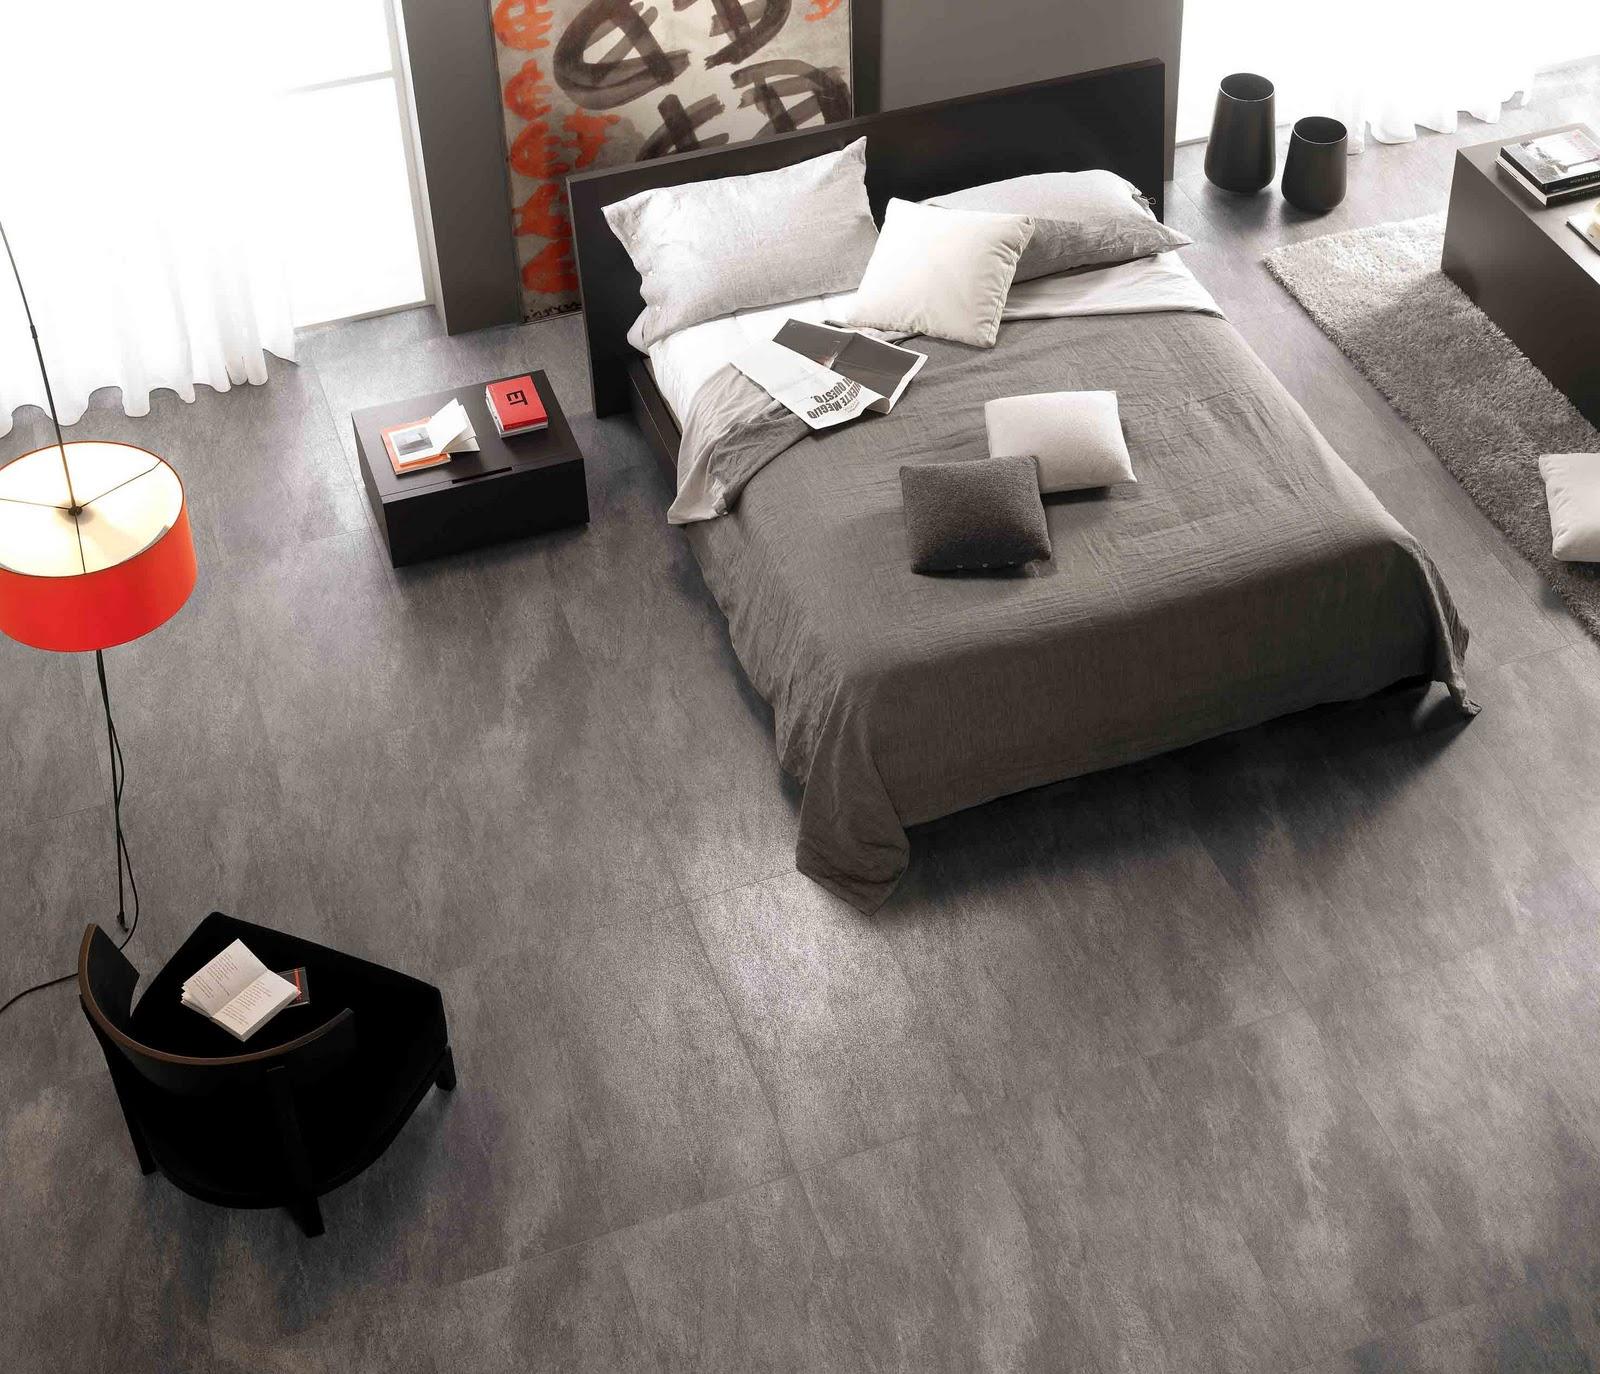 Top Arredamento Moderno: Pavimenti moderni UX66